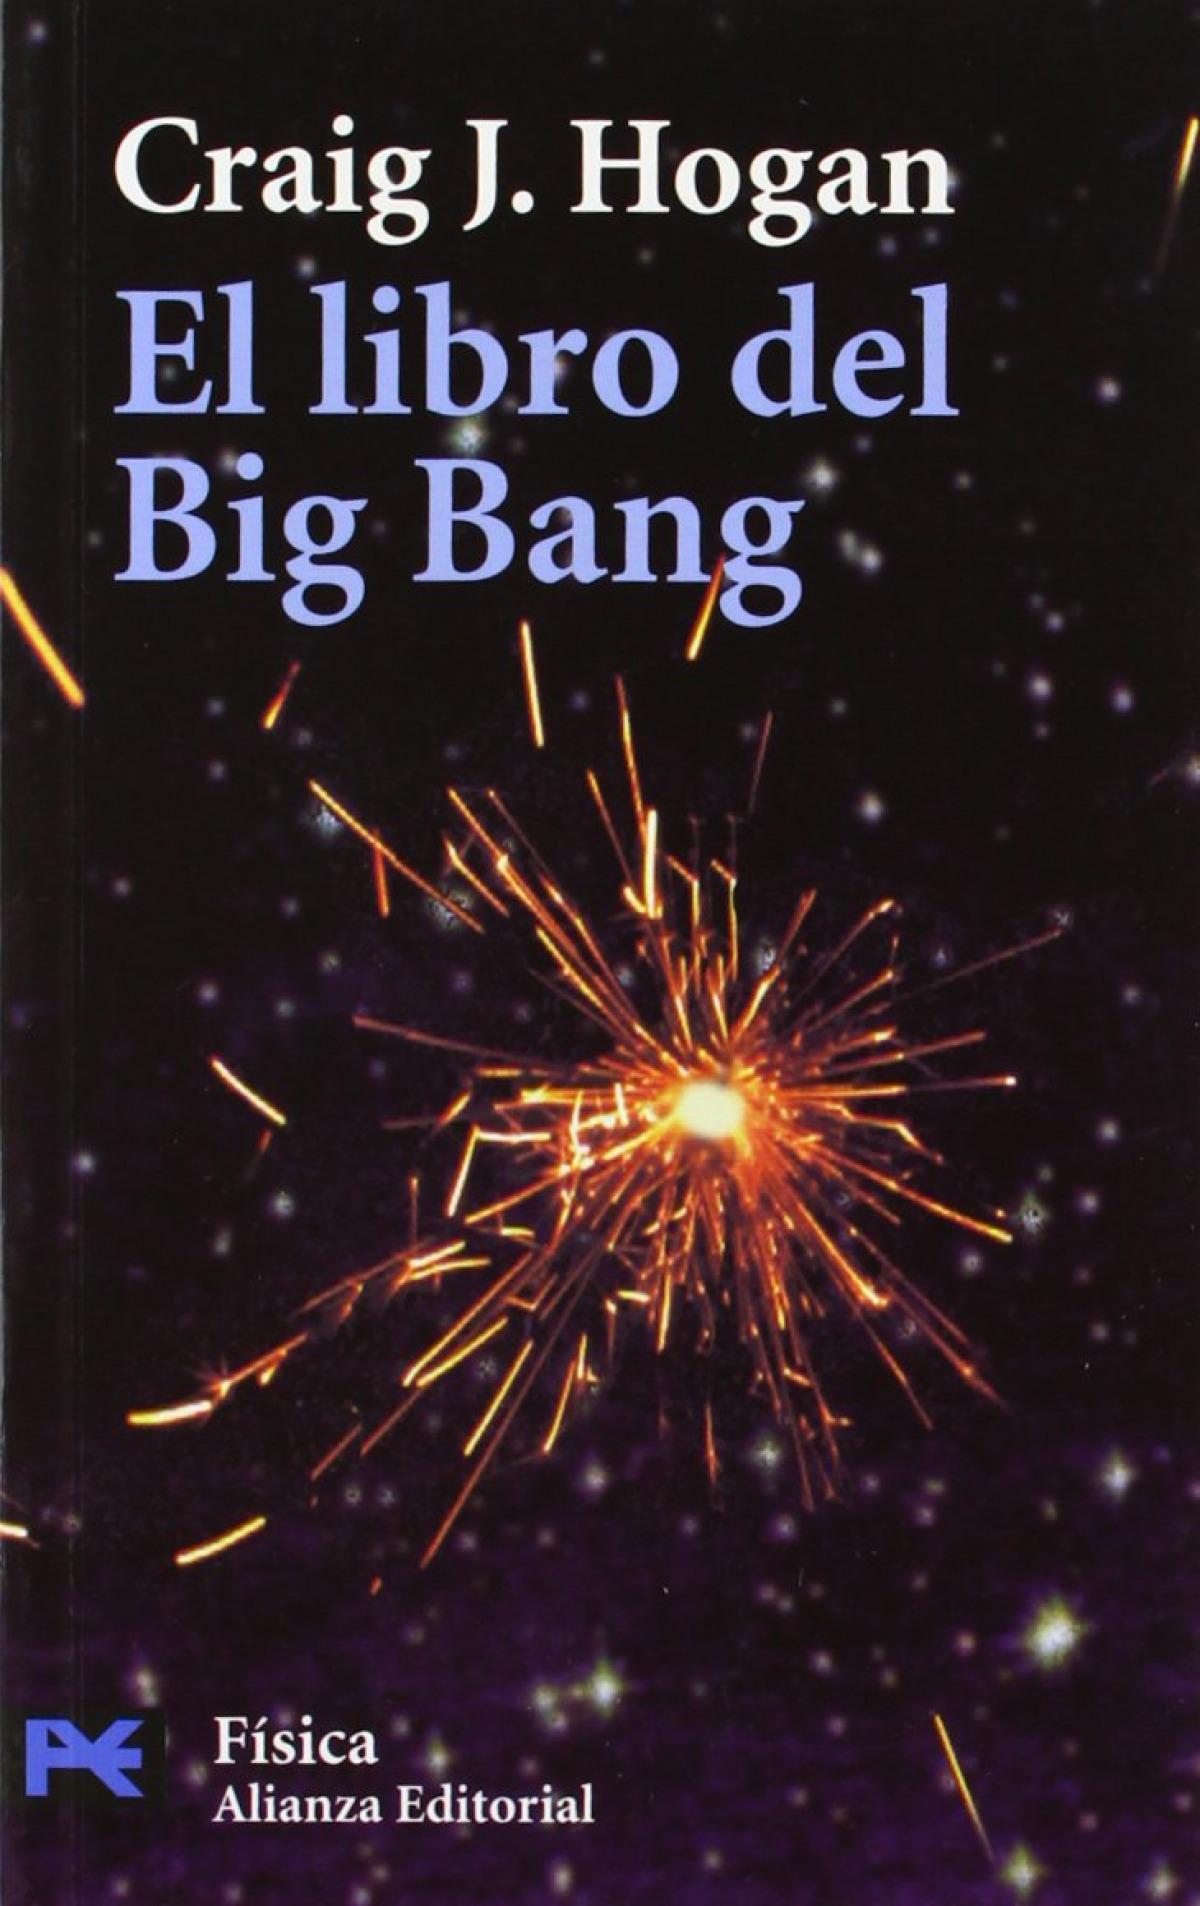 El libro del Big Bang